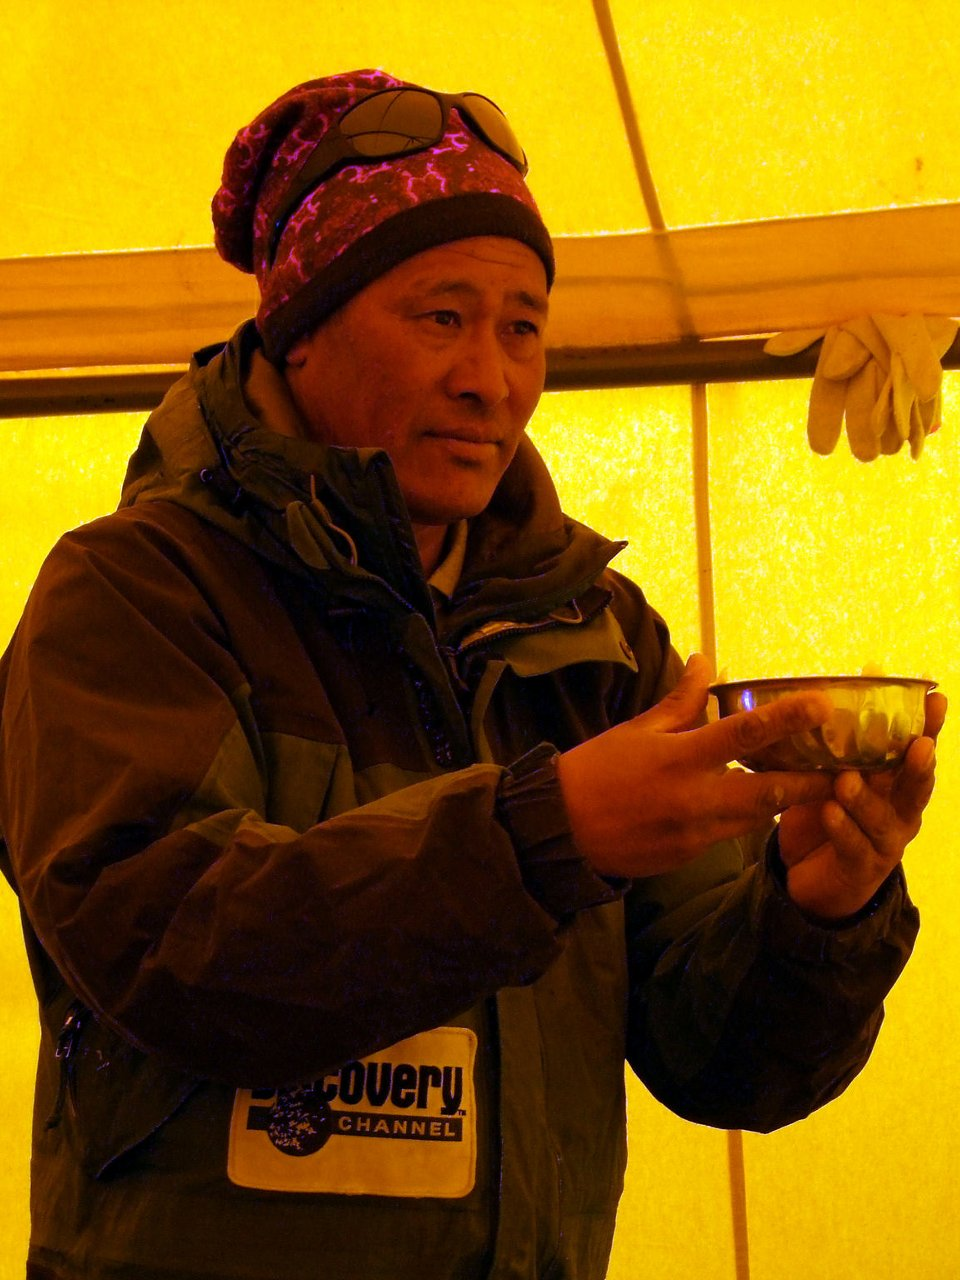 8b1adcce734 In memory of Chongba Sherpa of Tate